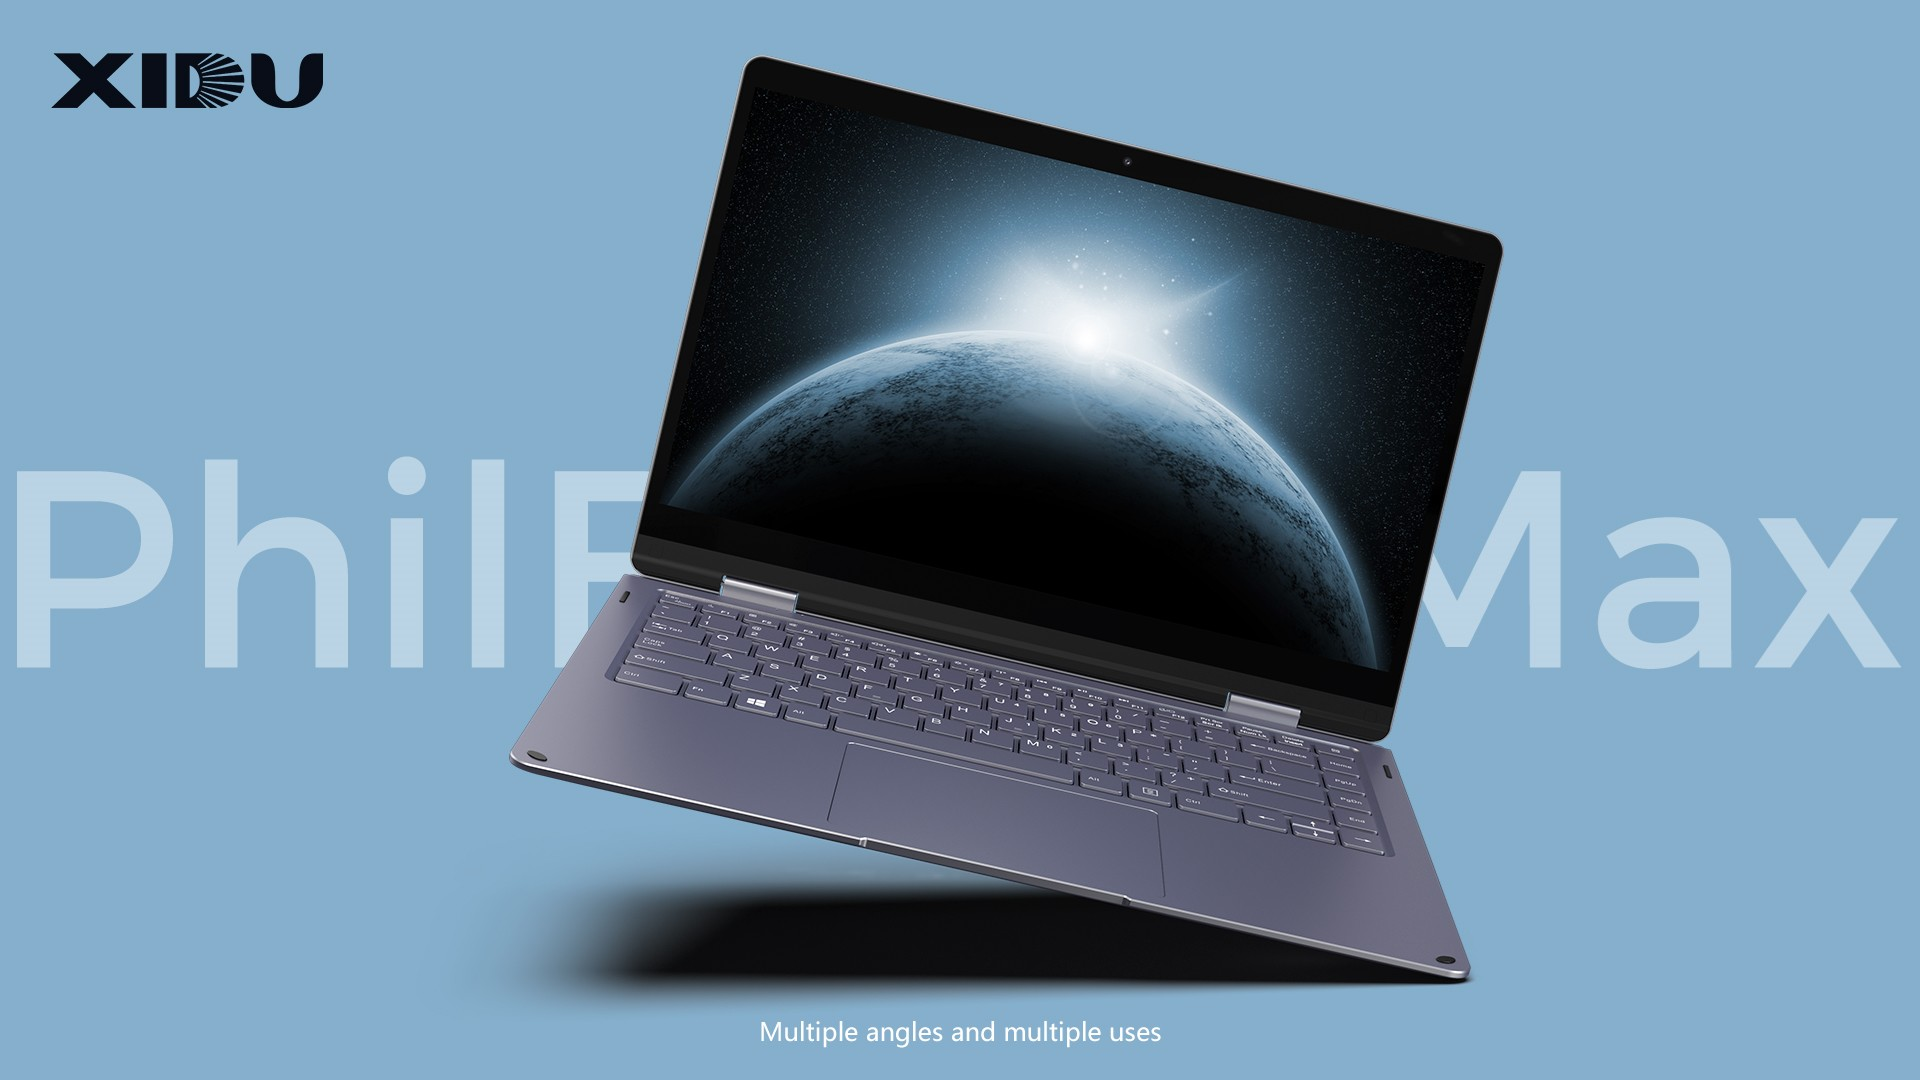 XIDU - PhilBook Max